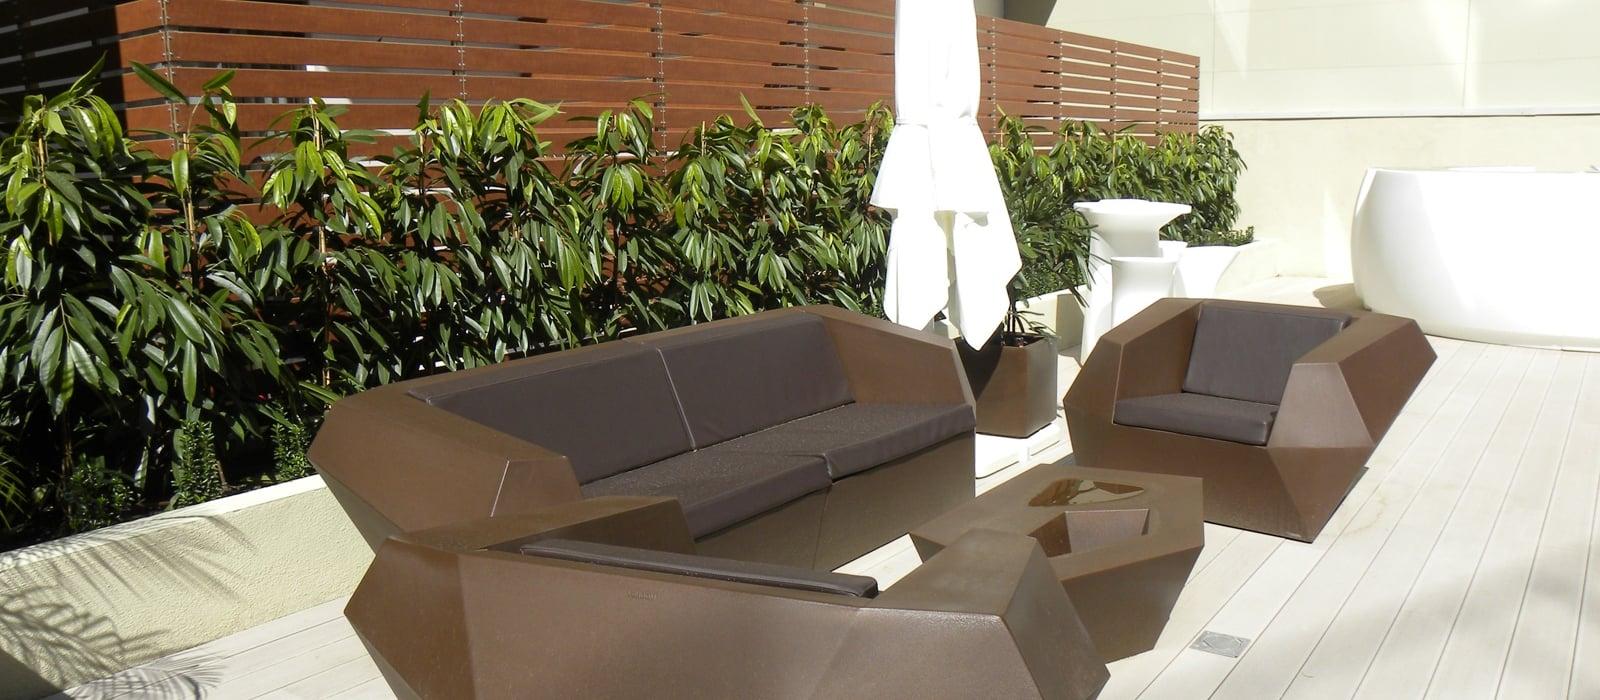 Services Hotel Barcelona Gala  - Vincci Hotels - Terrace